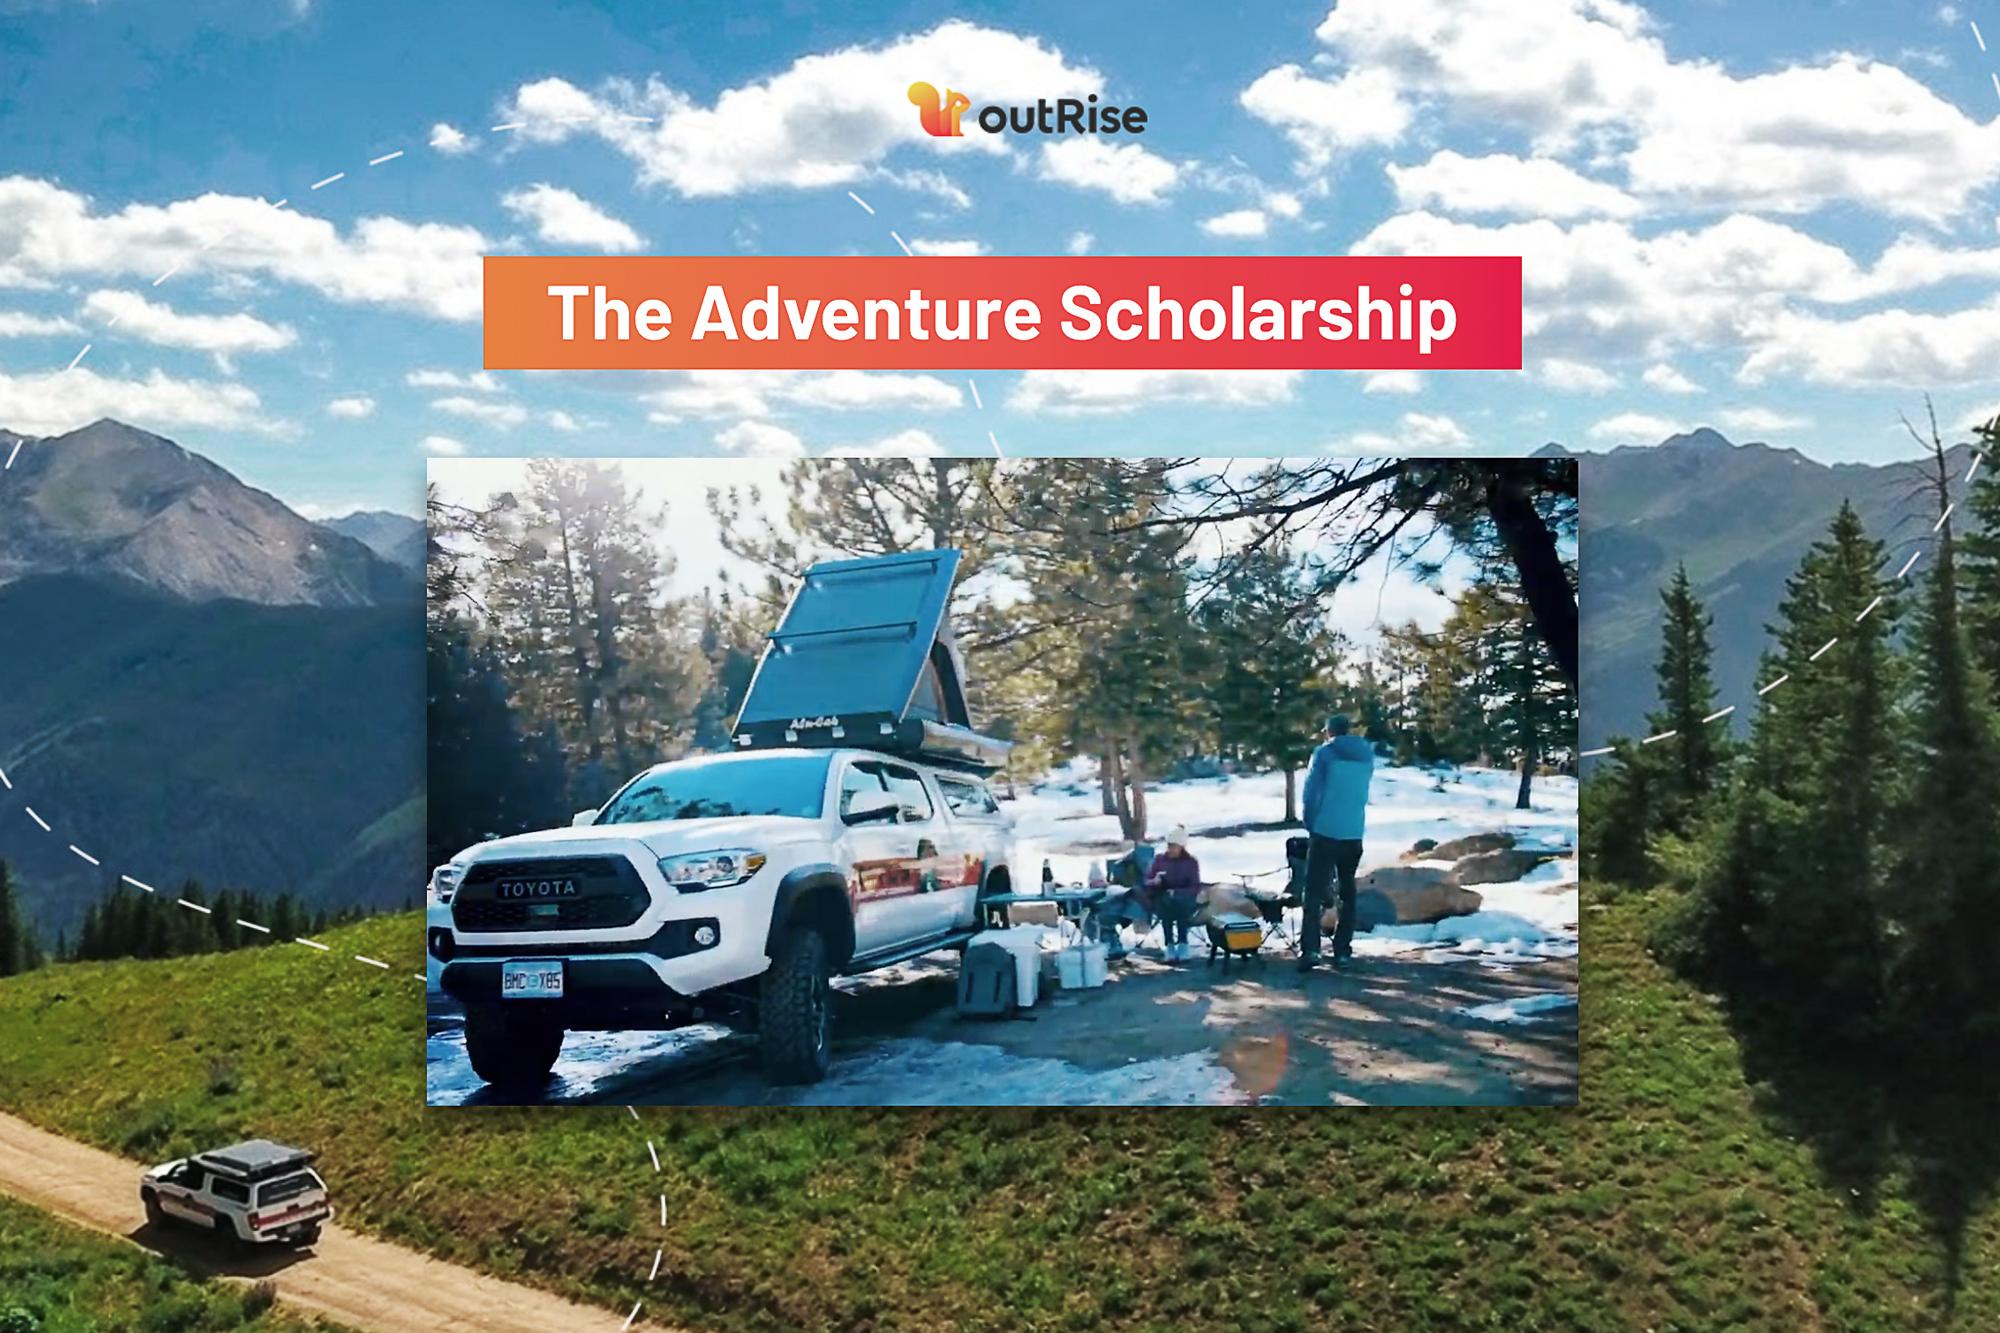 outrise adventure scholarship